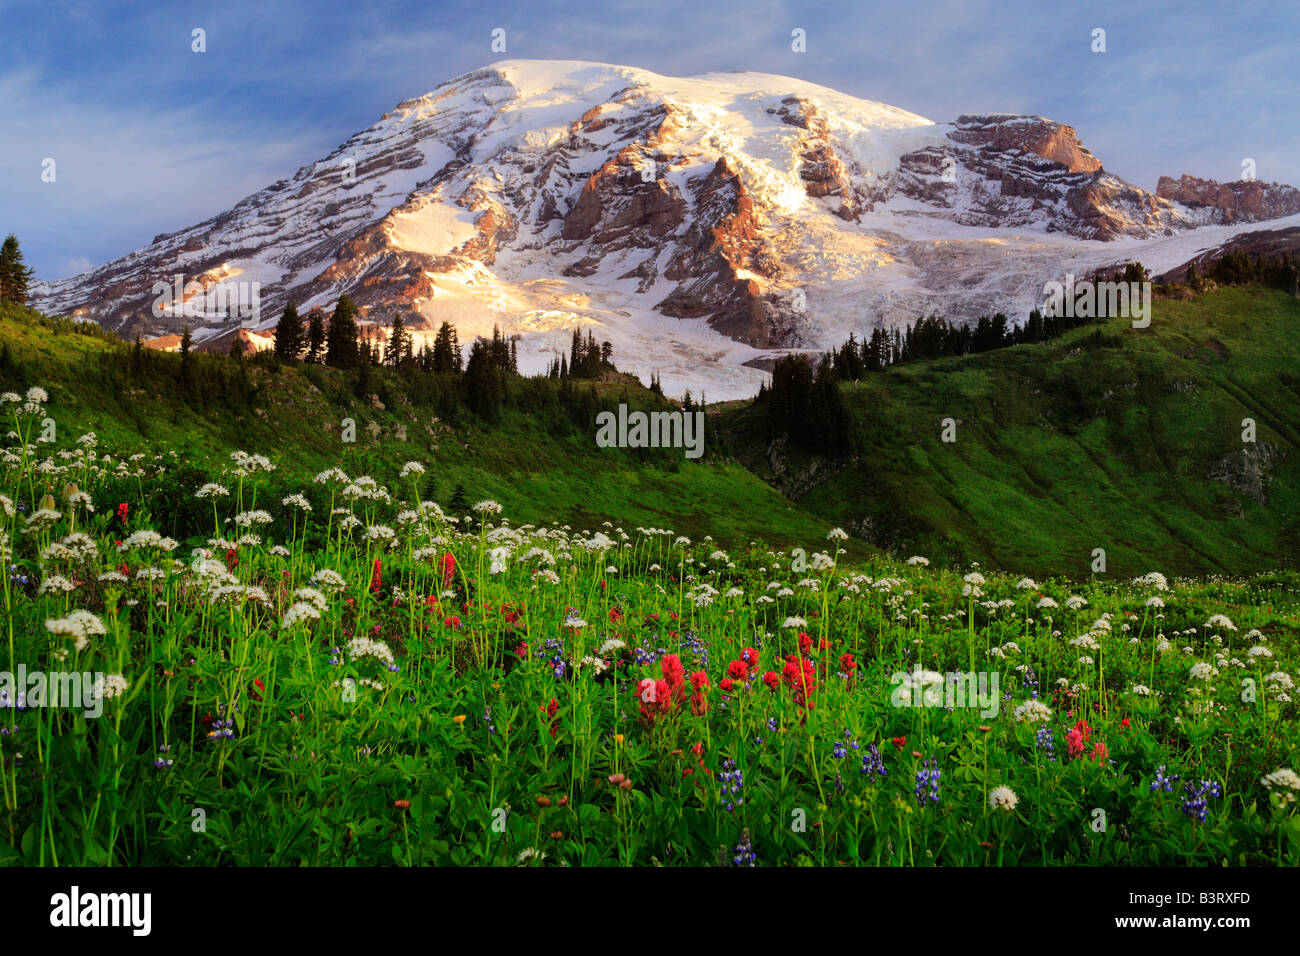 Wildflower meadow at Paradise, Mount Rainier, Washington, USA - Stock Image